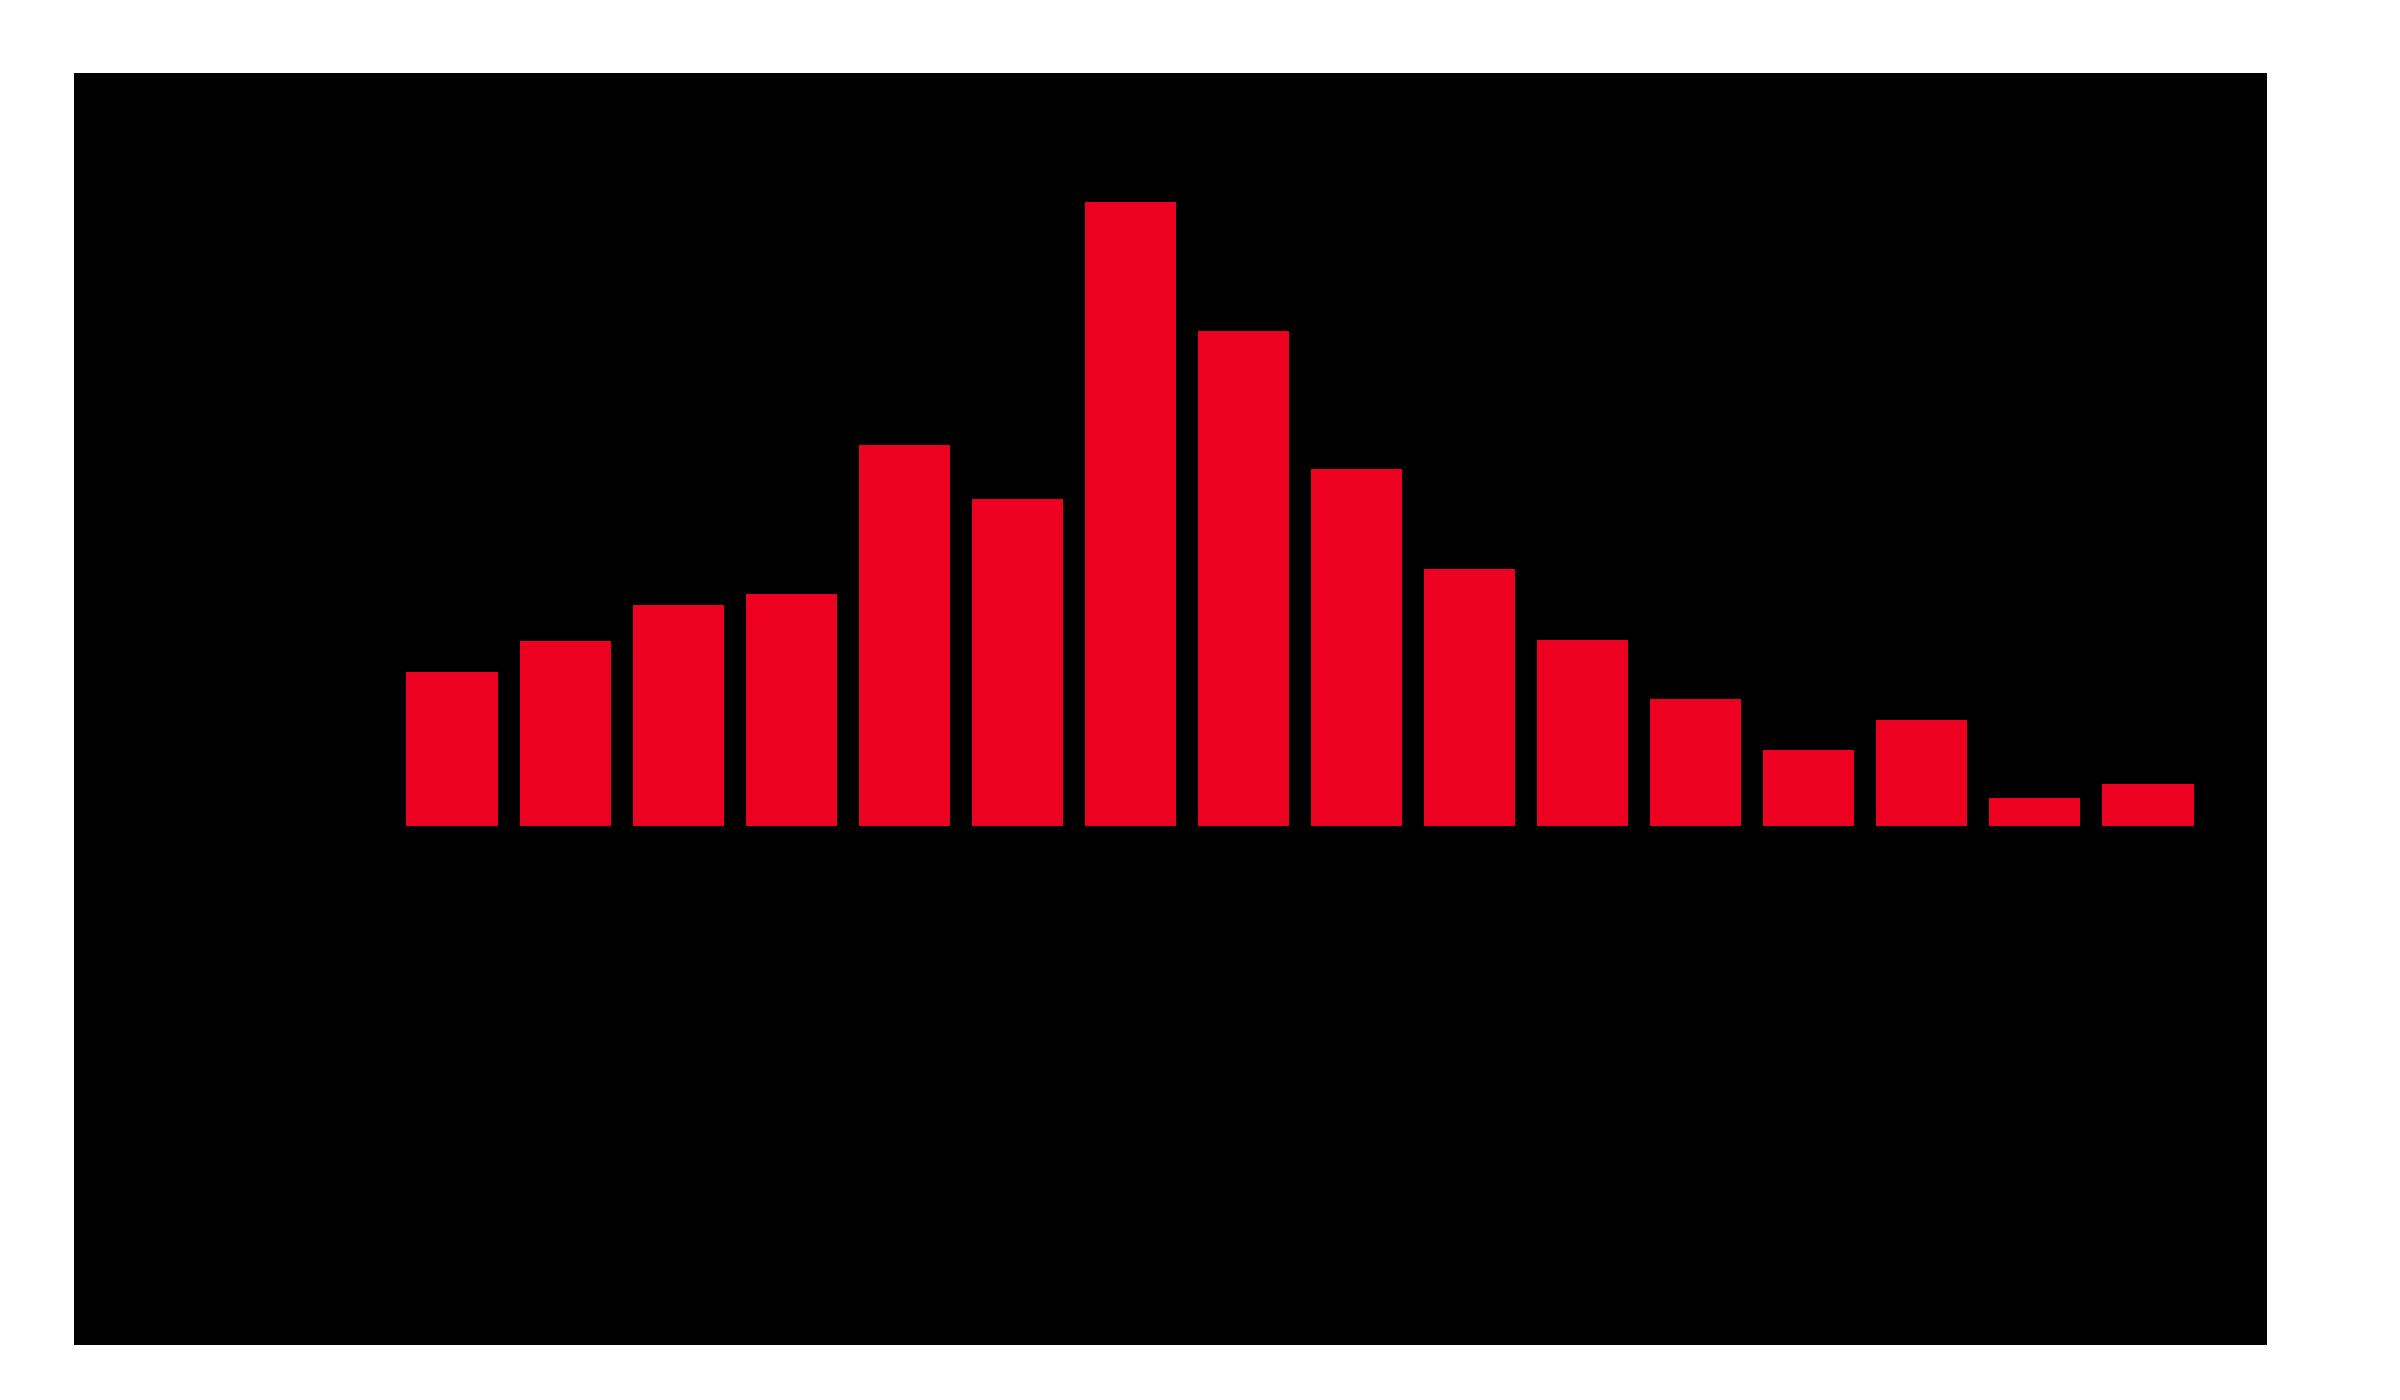 全国の年収分布 総数 男